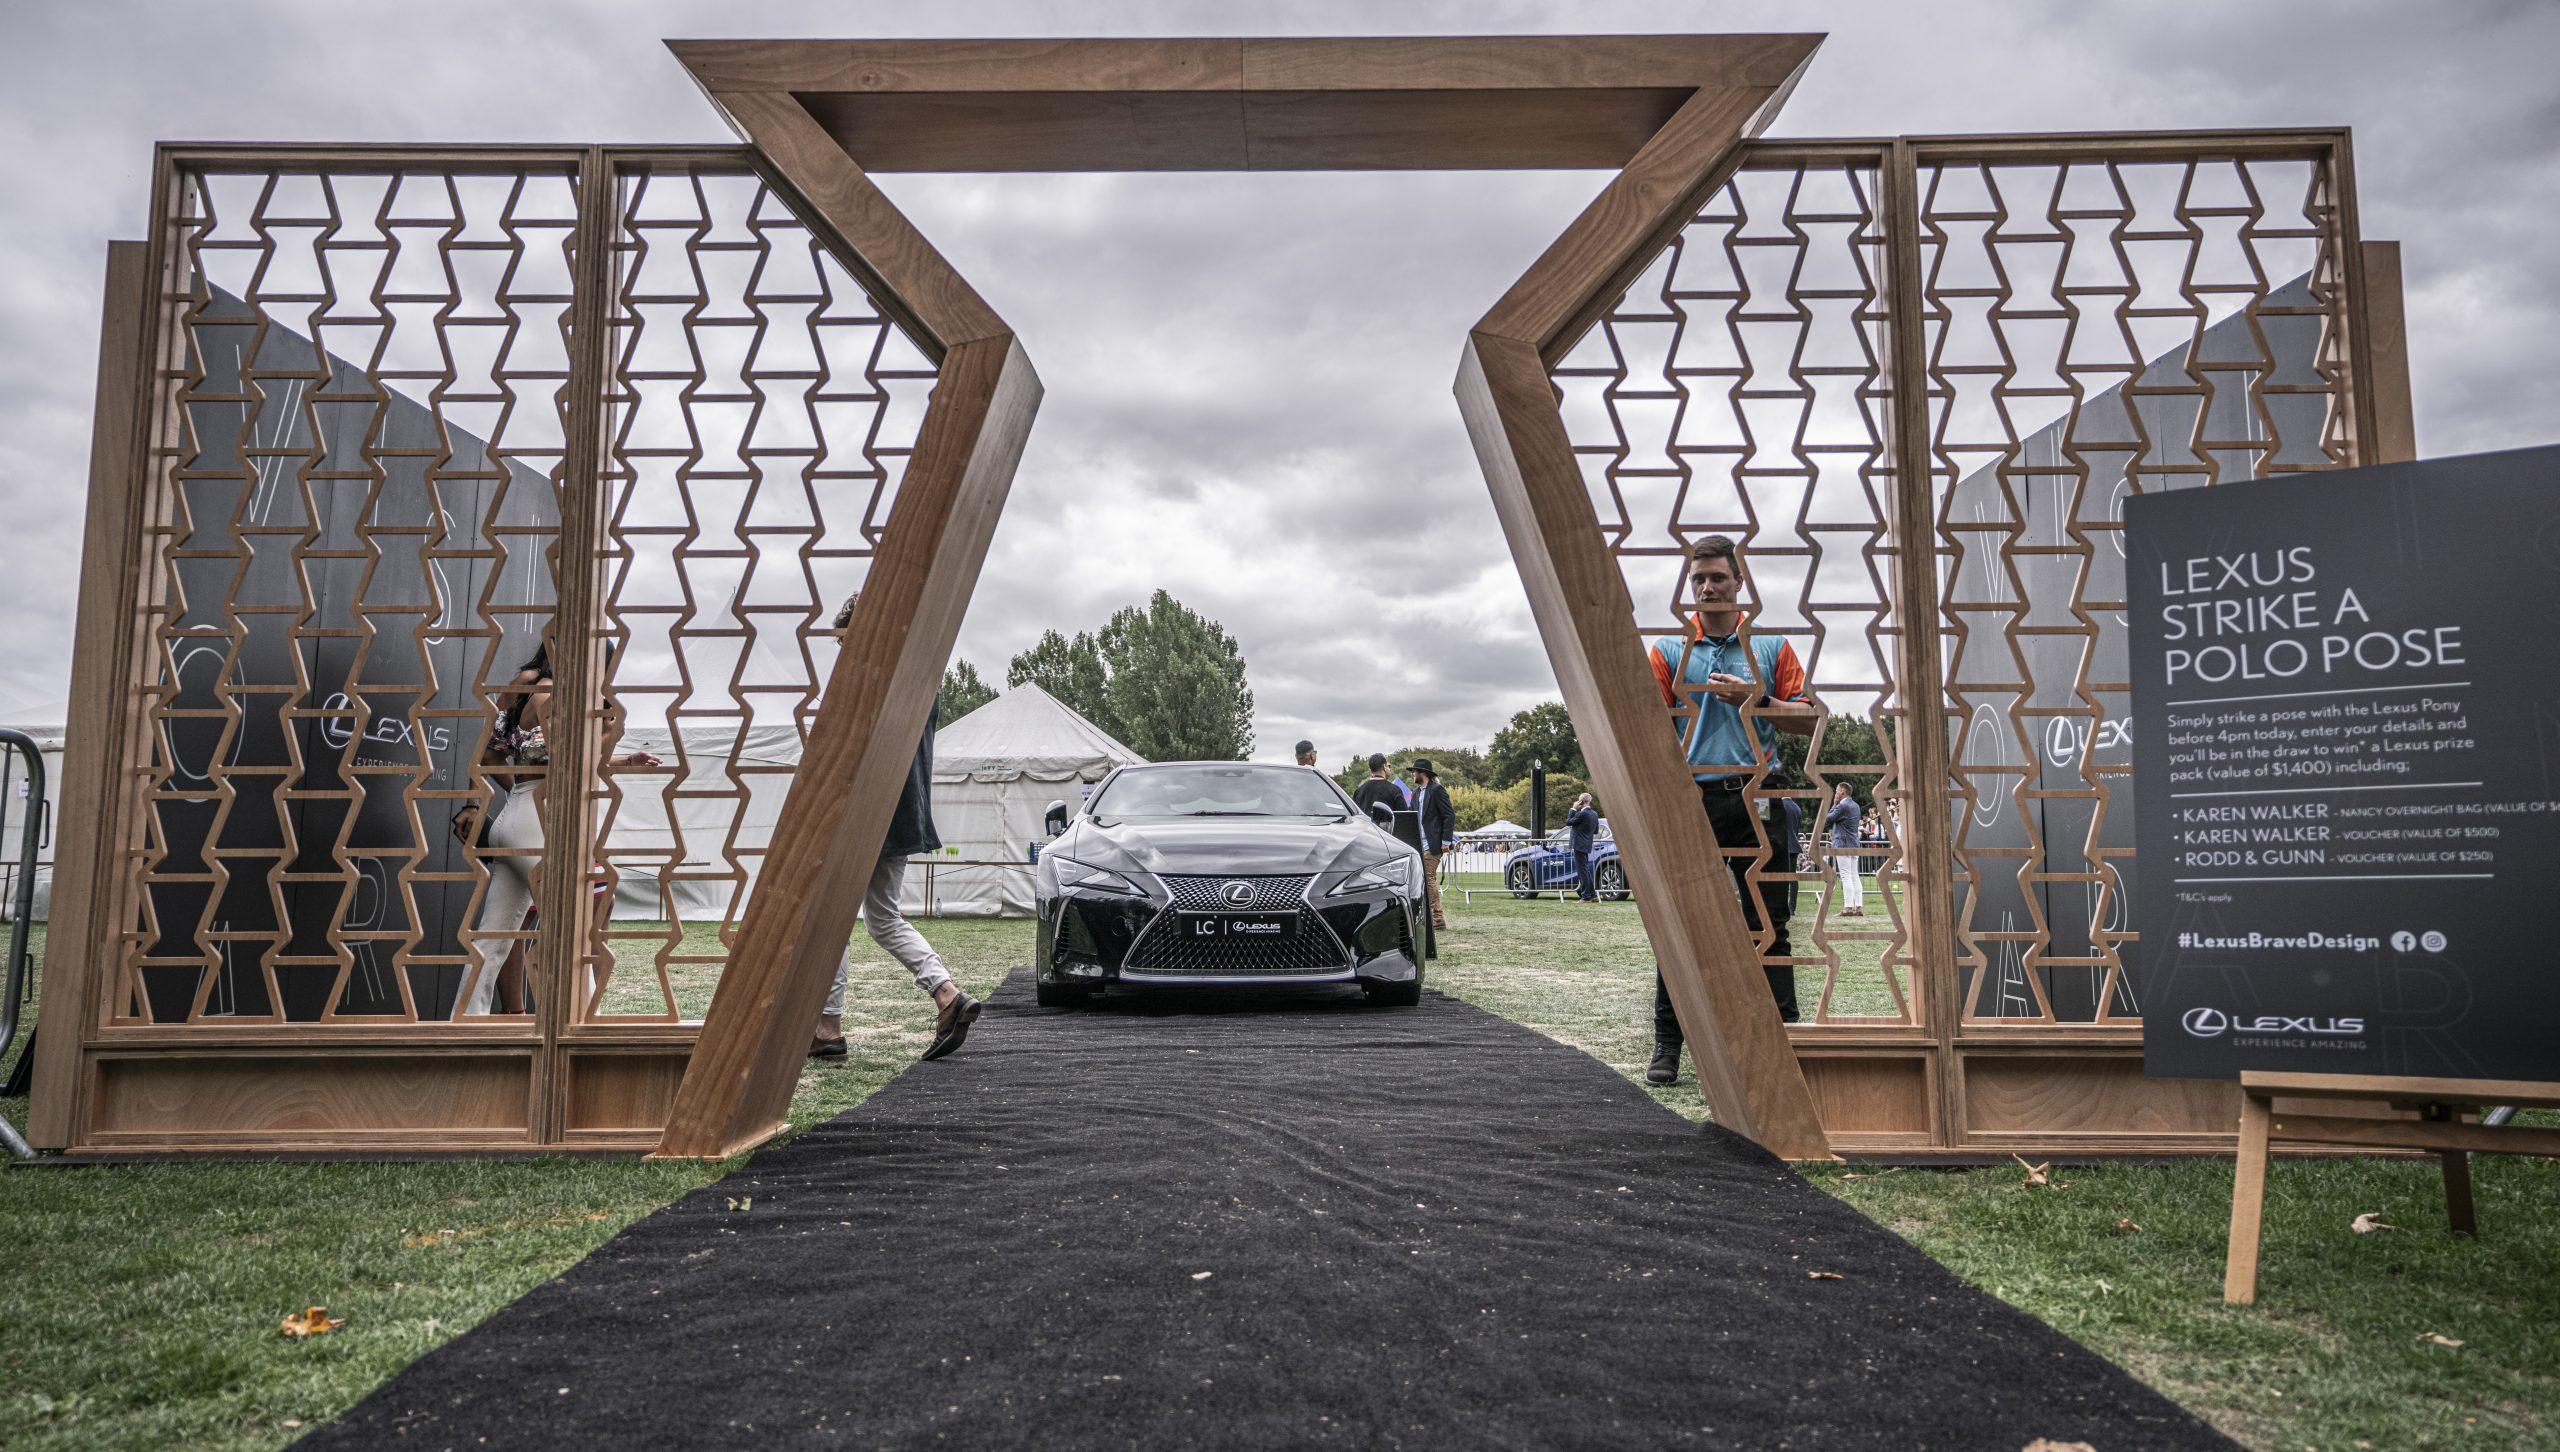 Lexus at the Polo